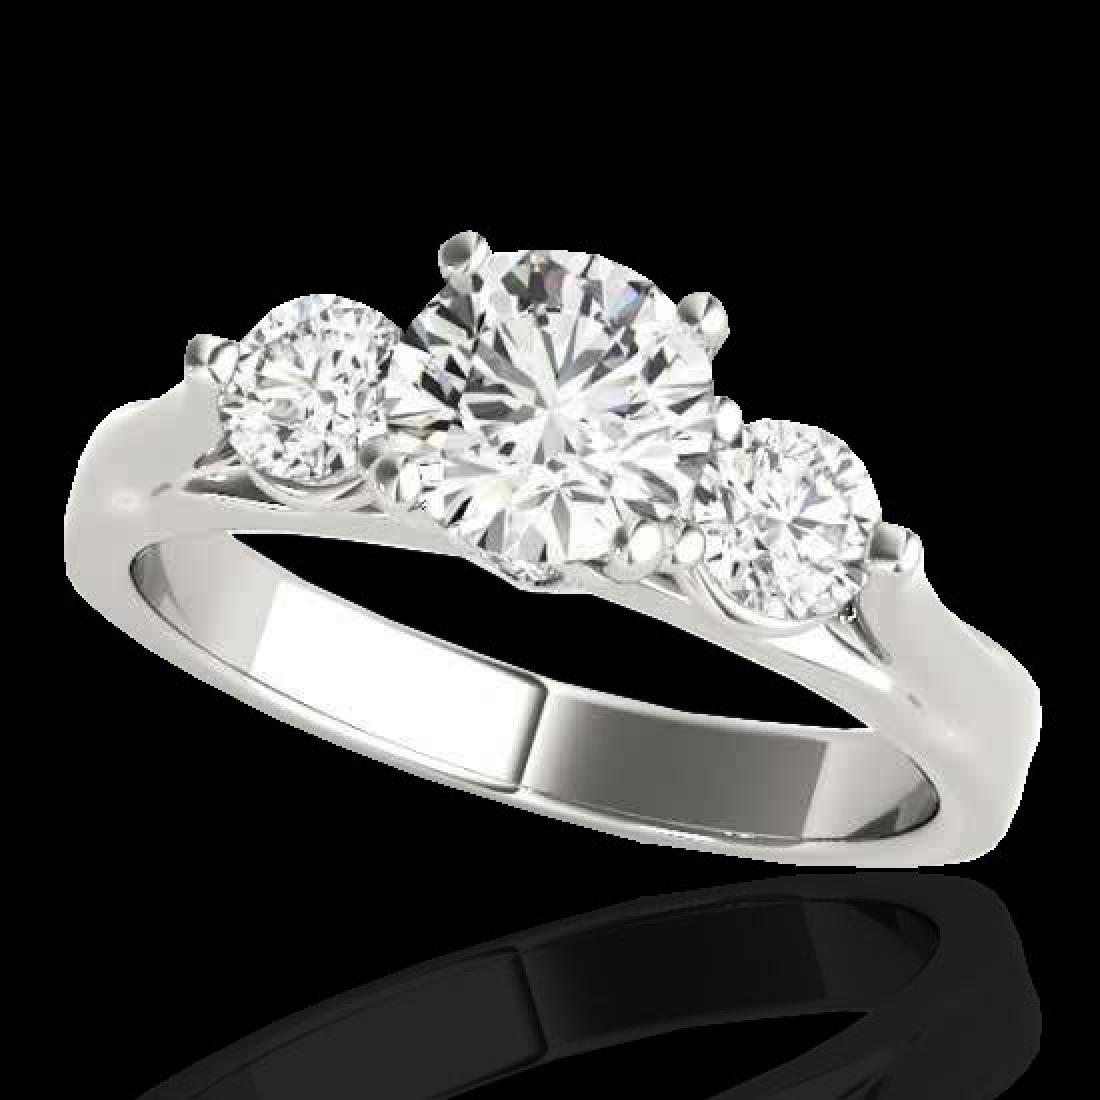 1.5 CTW H-SI/I Certified Diamond 3 Stone Ring 10K White